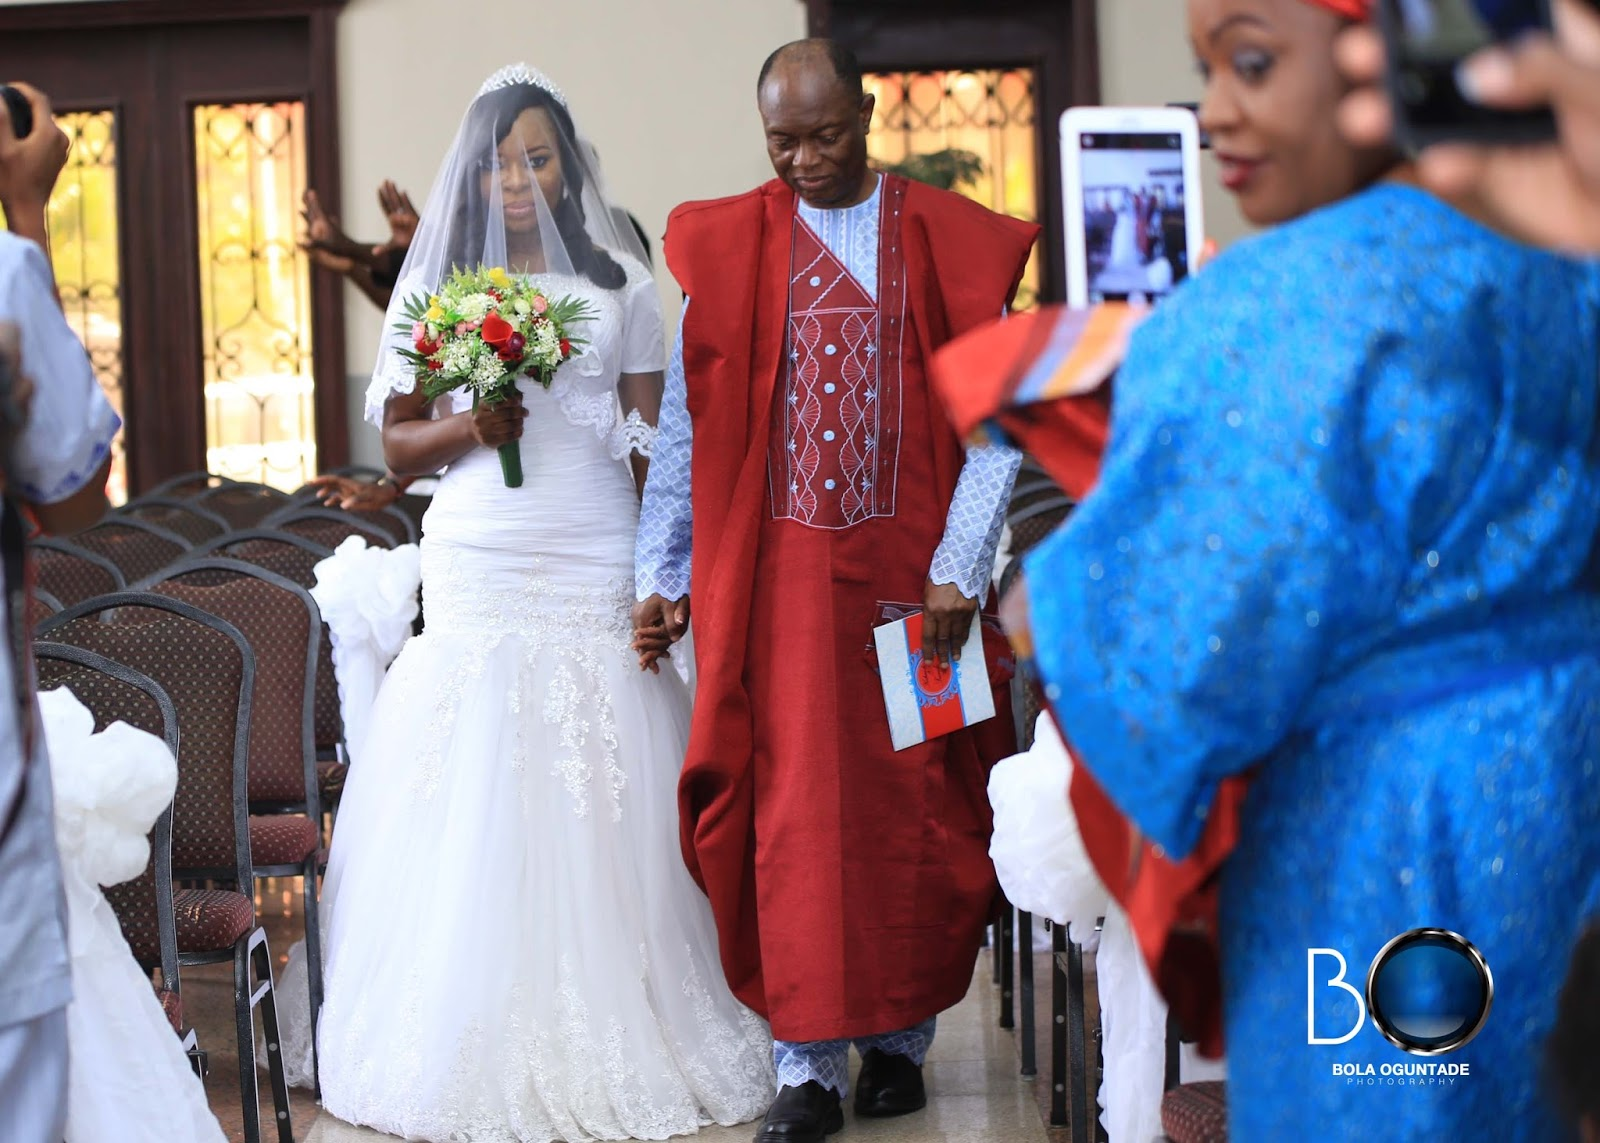 Evangelical church wedding